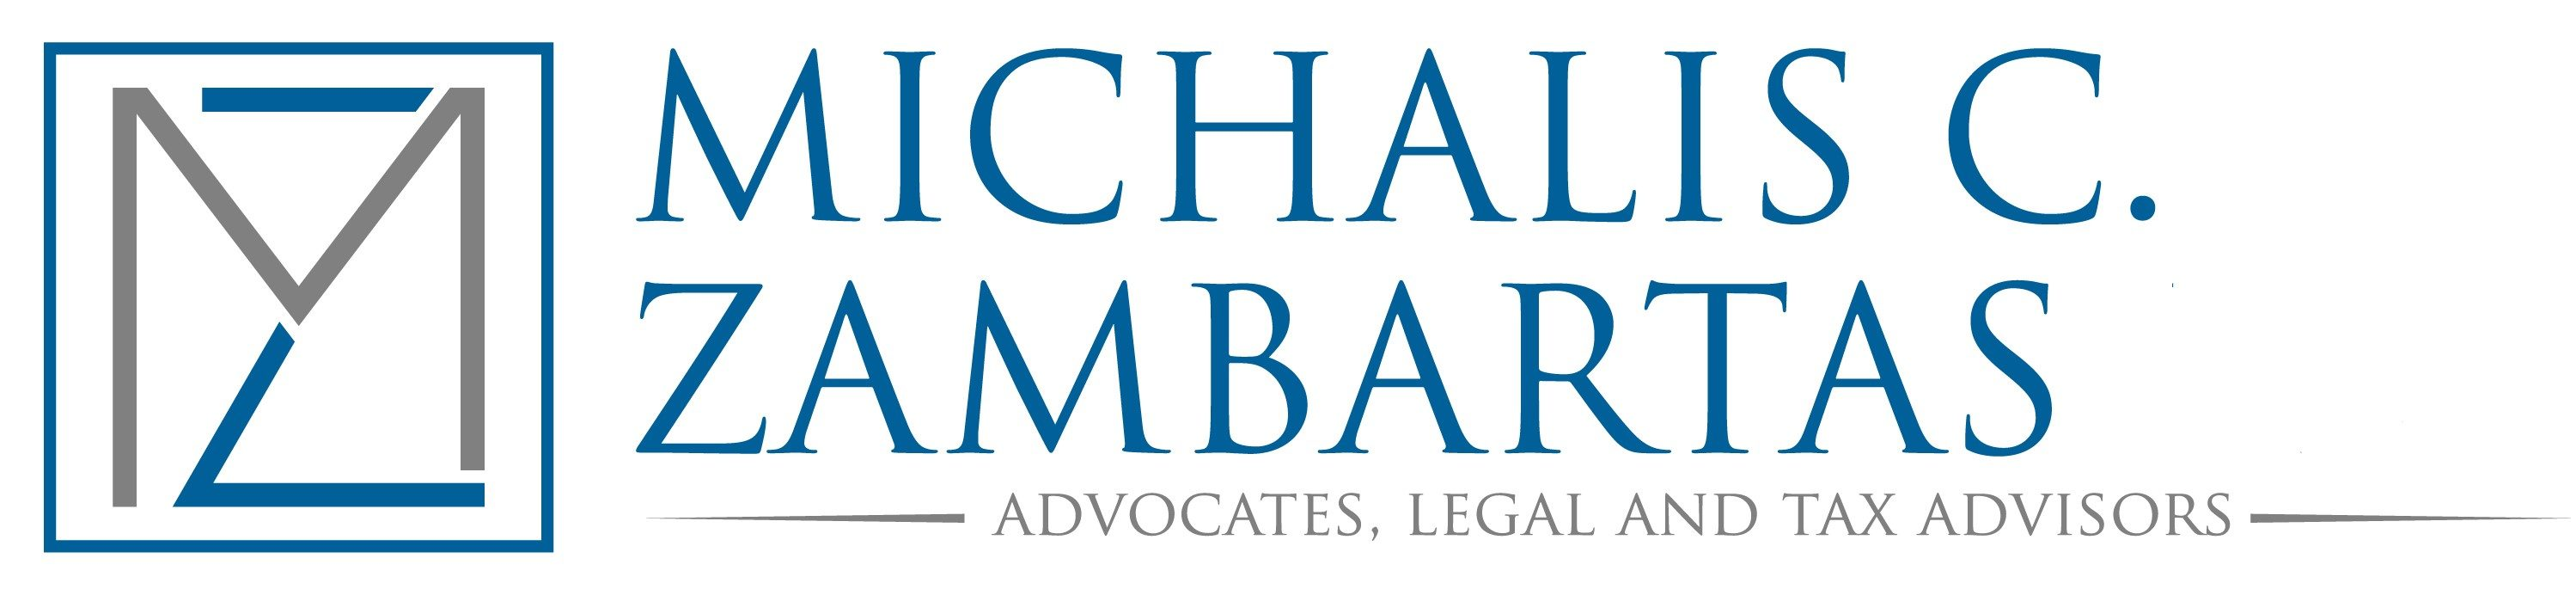 MICHALIS C. ZAMBARTAS, Advocates, Legal & Tax Advisors